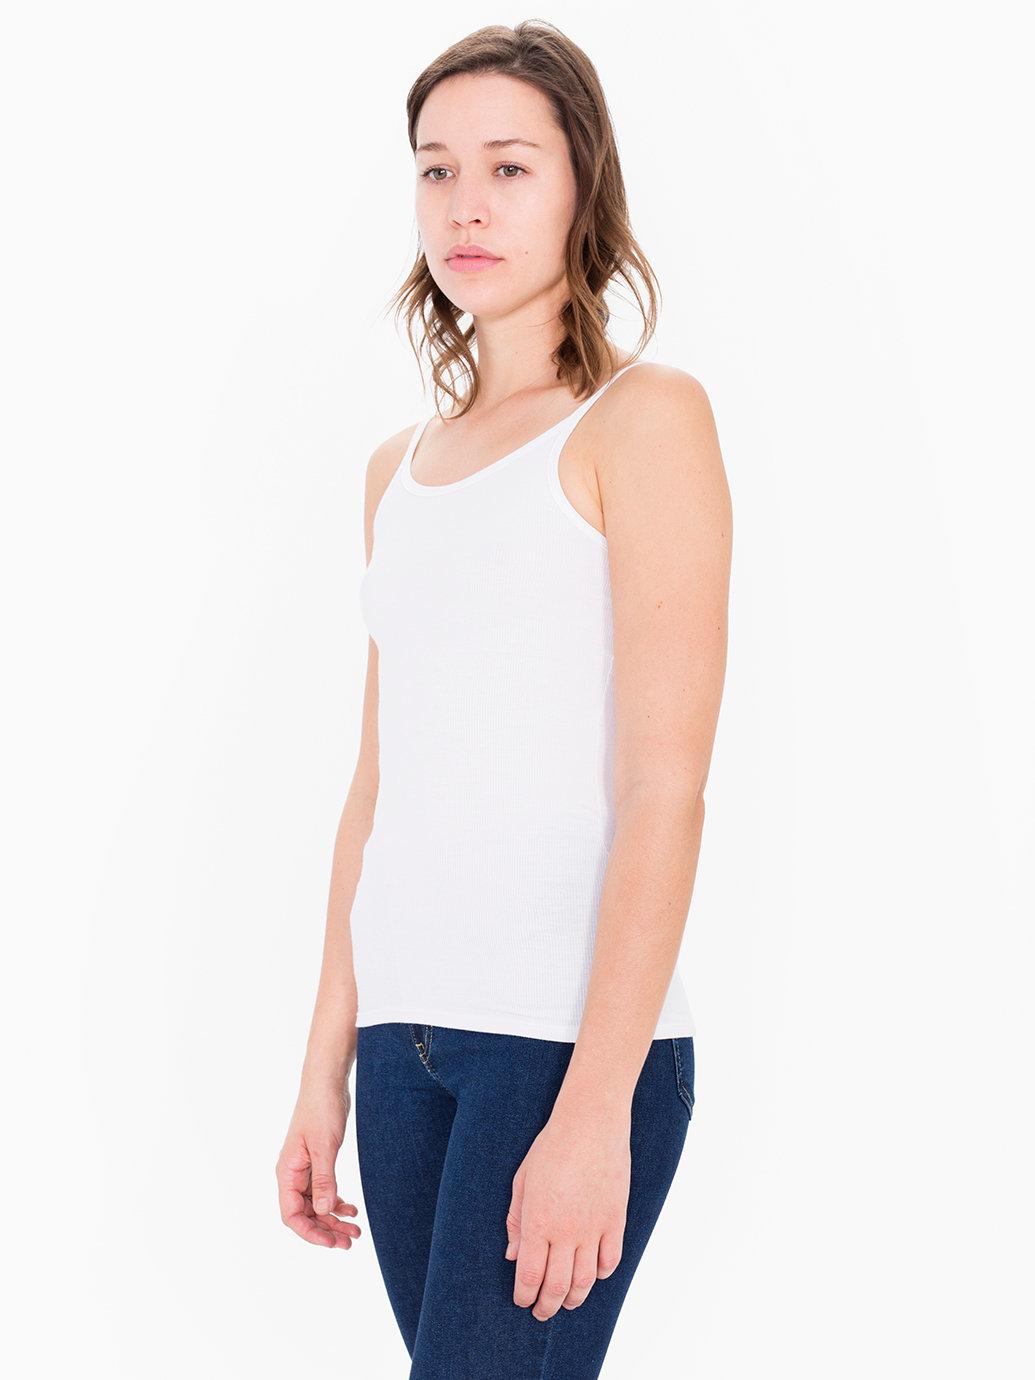 oz., 50% combed ringspun cotton/ 50% polyester 3/4